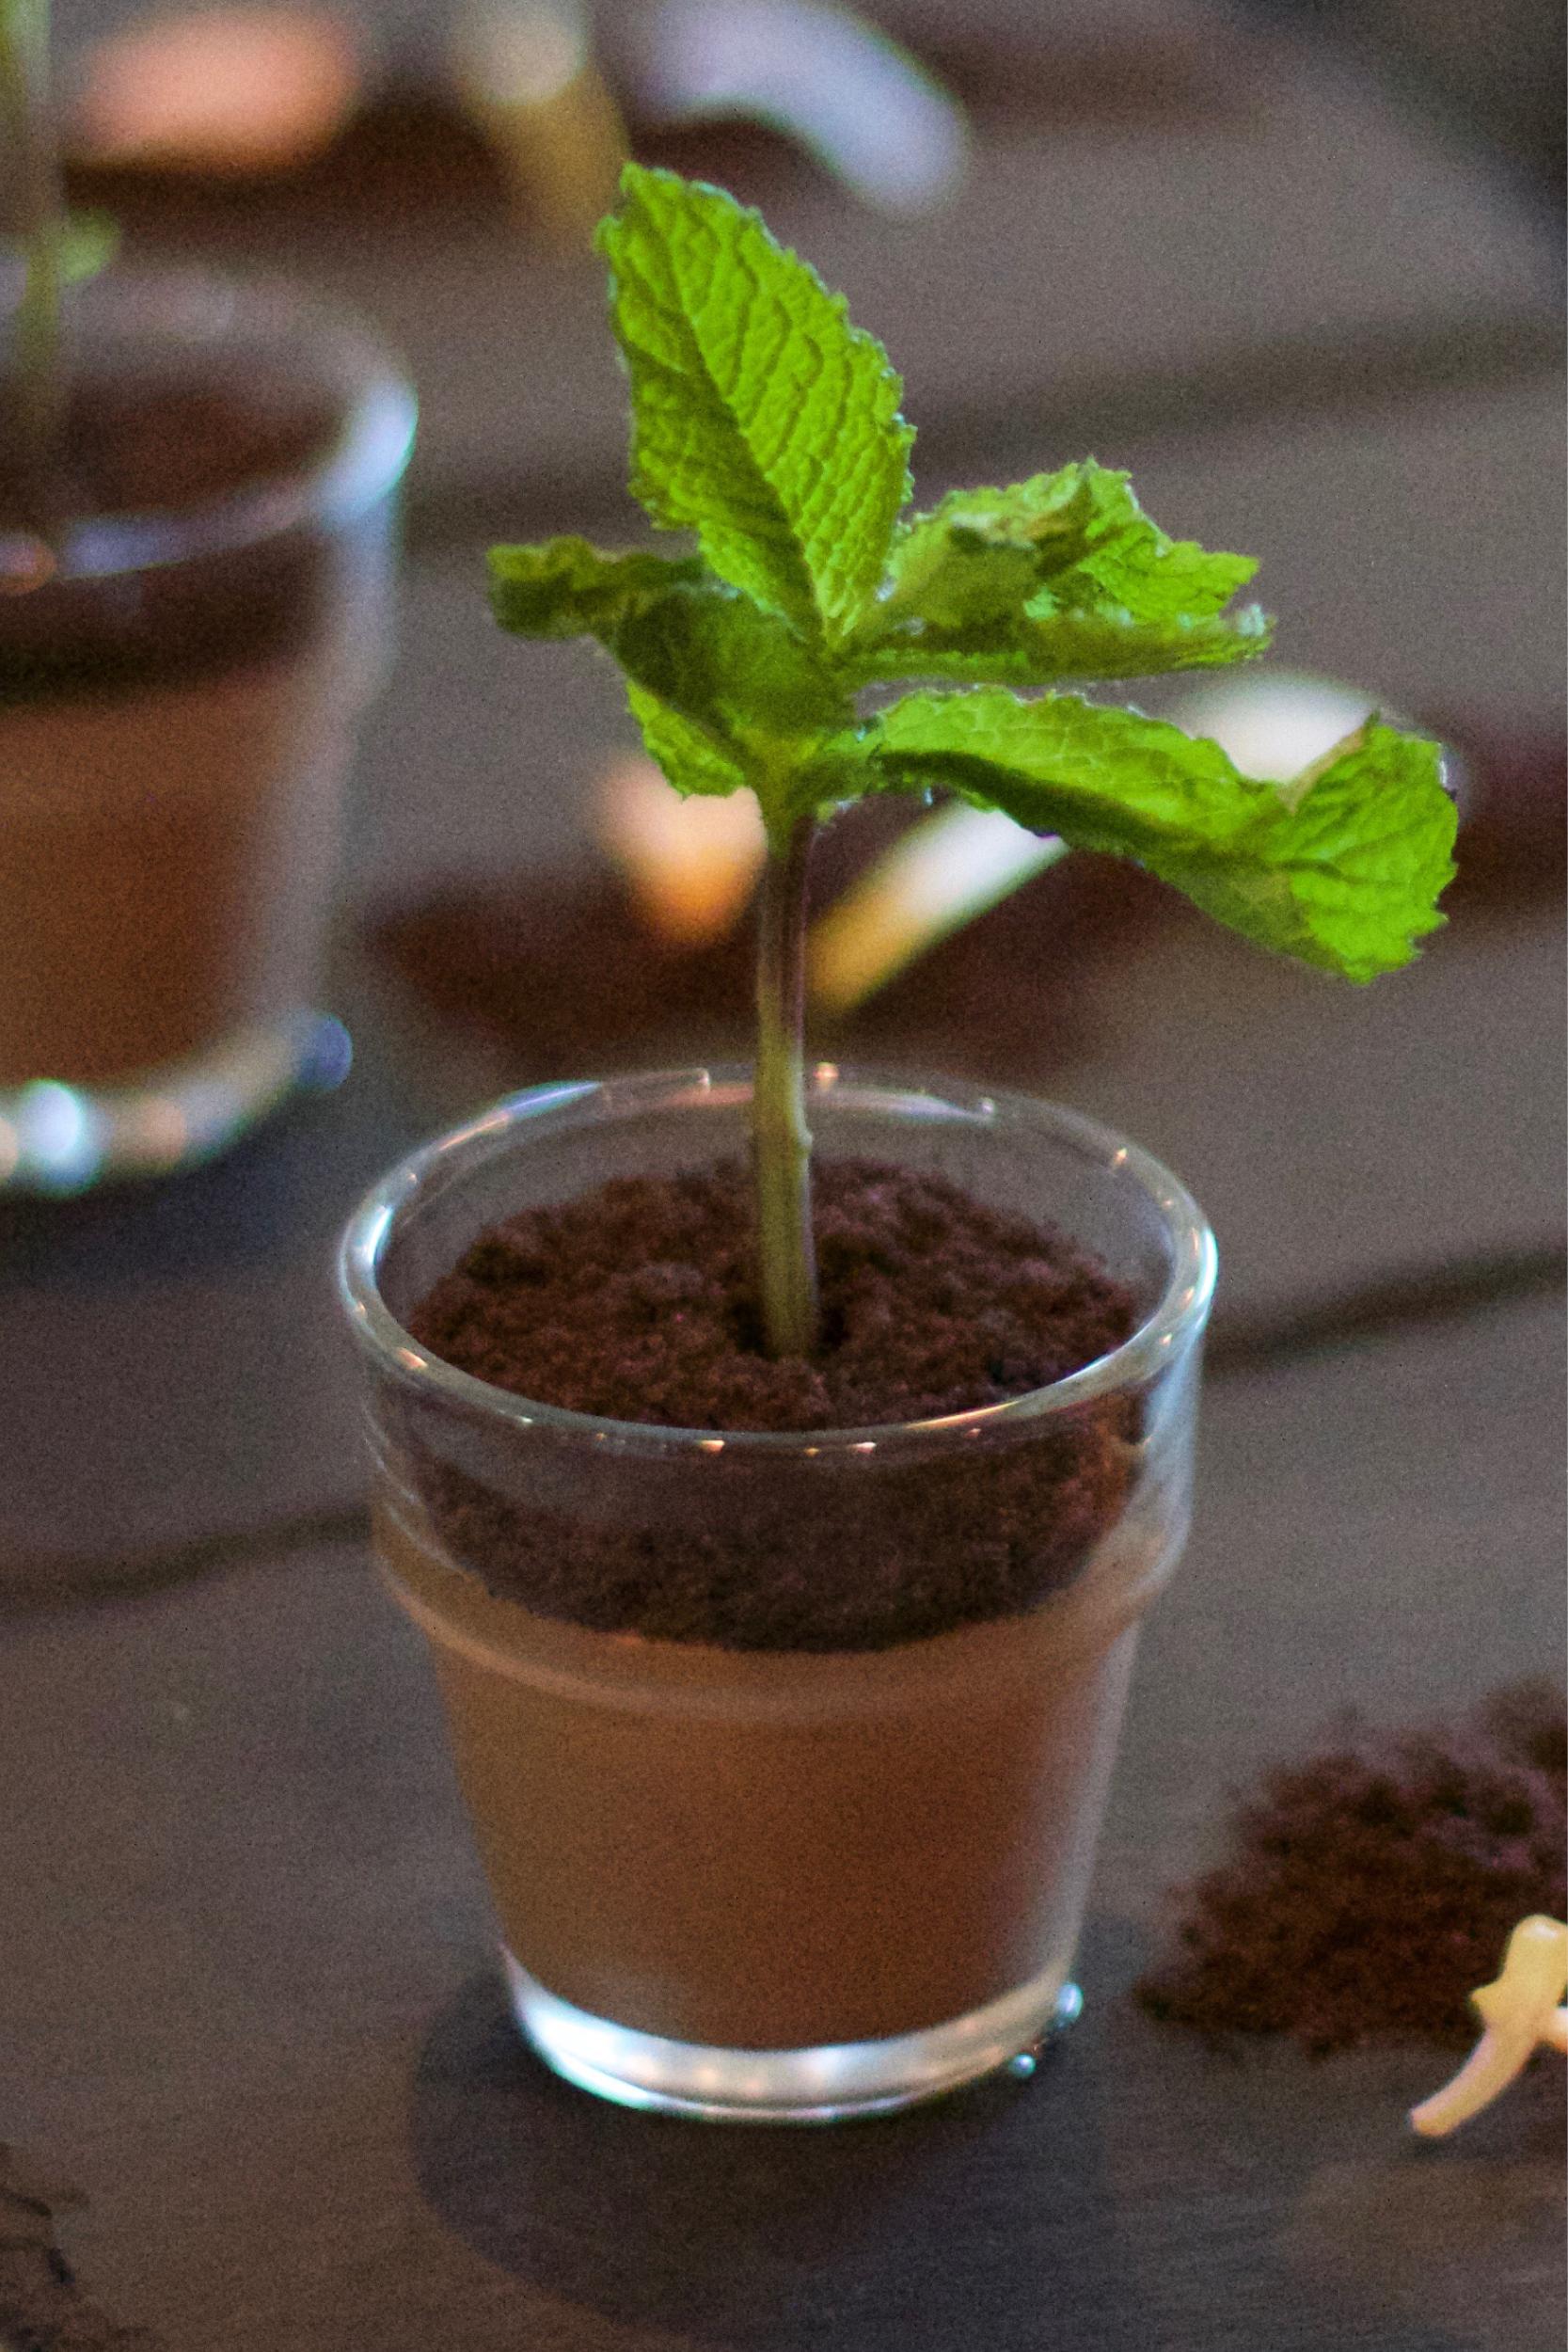 Potted-Plant-Dessert-1.jpg